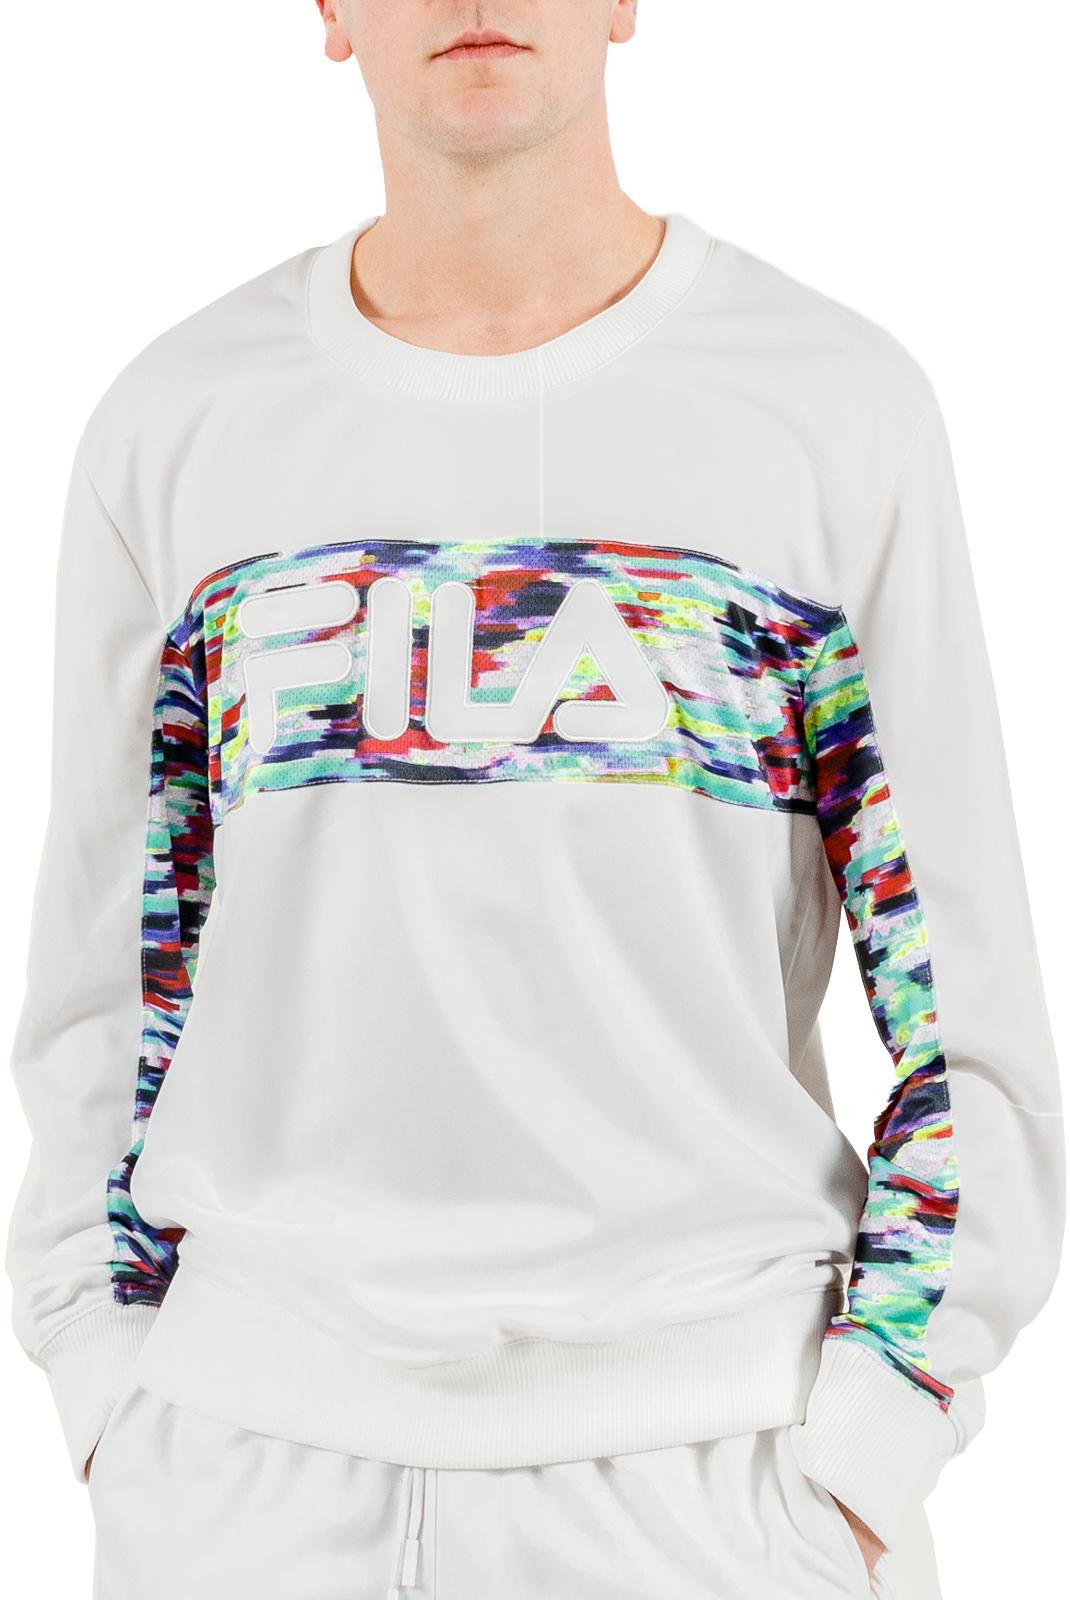 Sweatshirts  Fila 684486 walter 1 WHITE